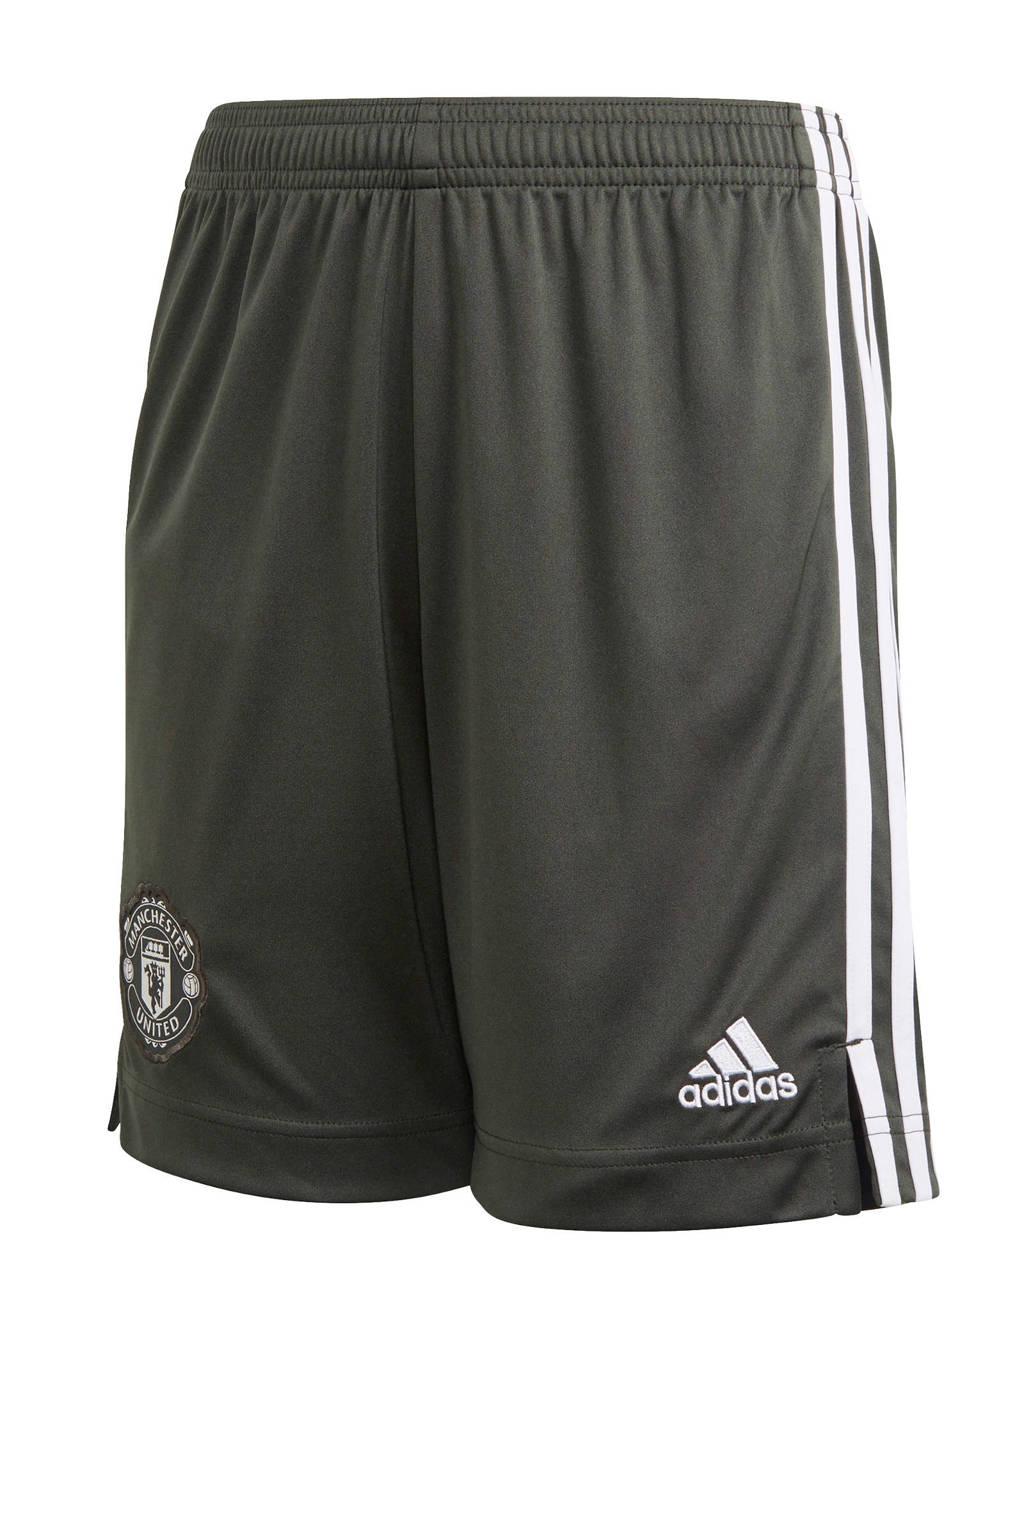 adidas Performance Junior Manchester United voetbalshort Uit, Donkergroen